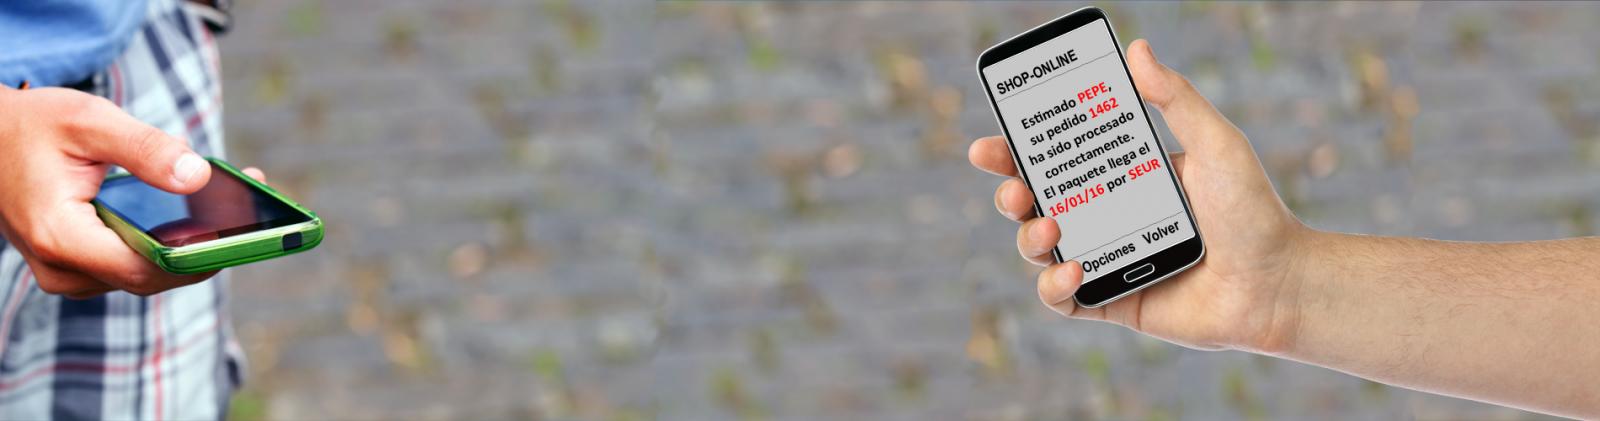 sms push personalizados